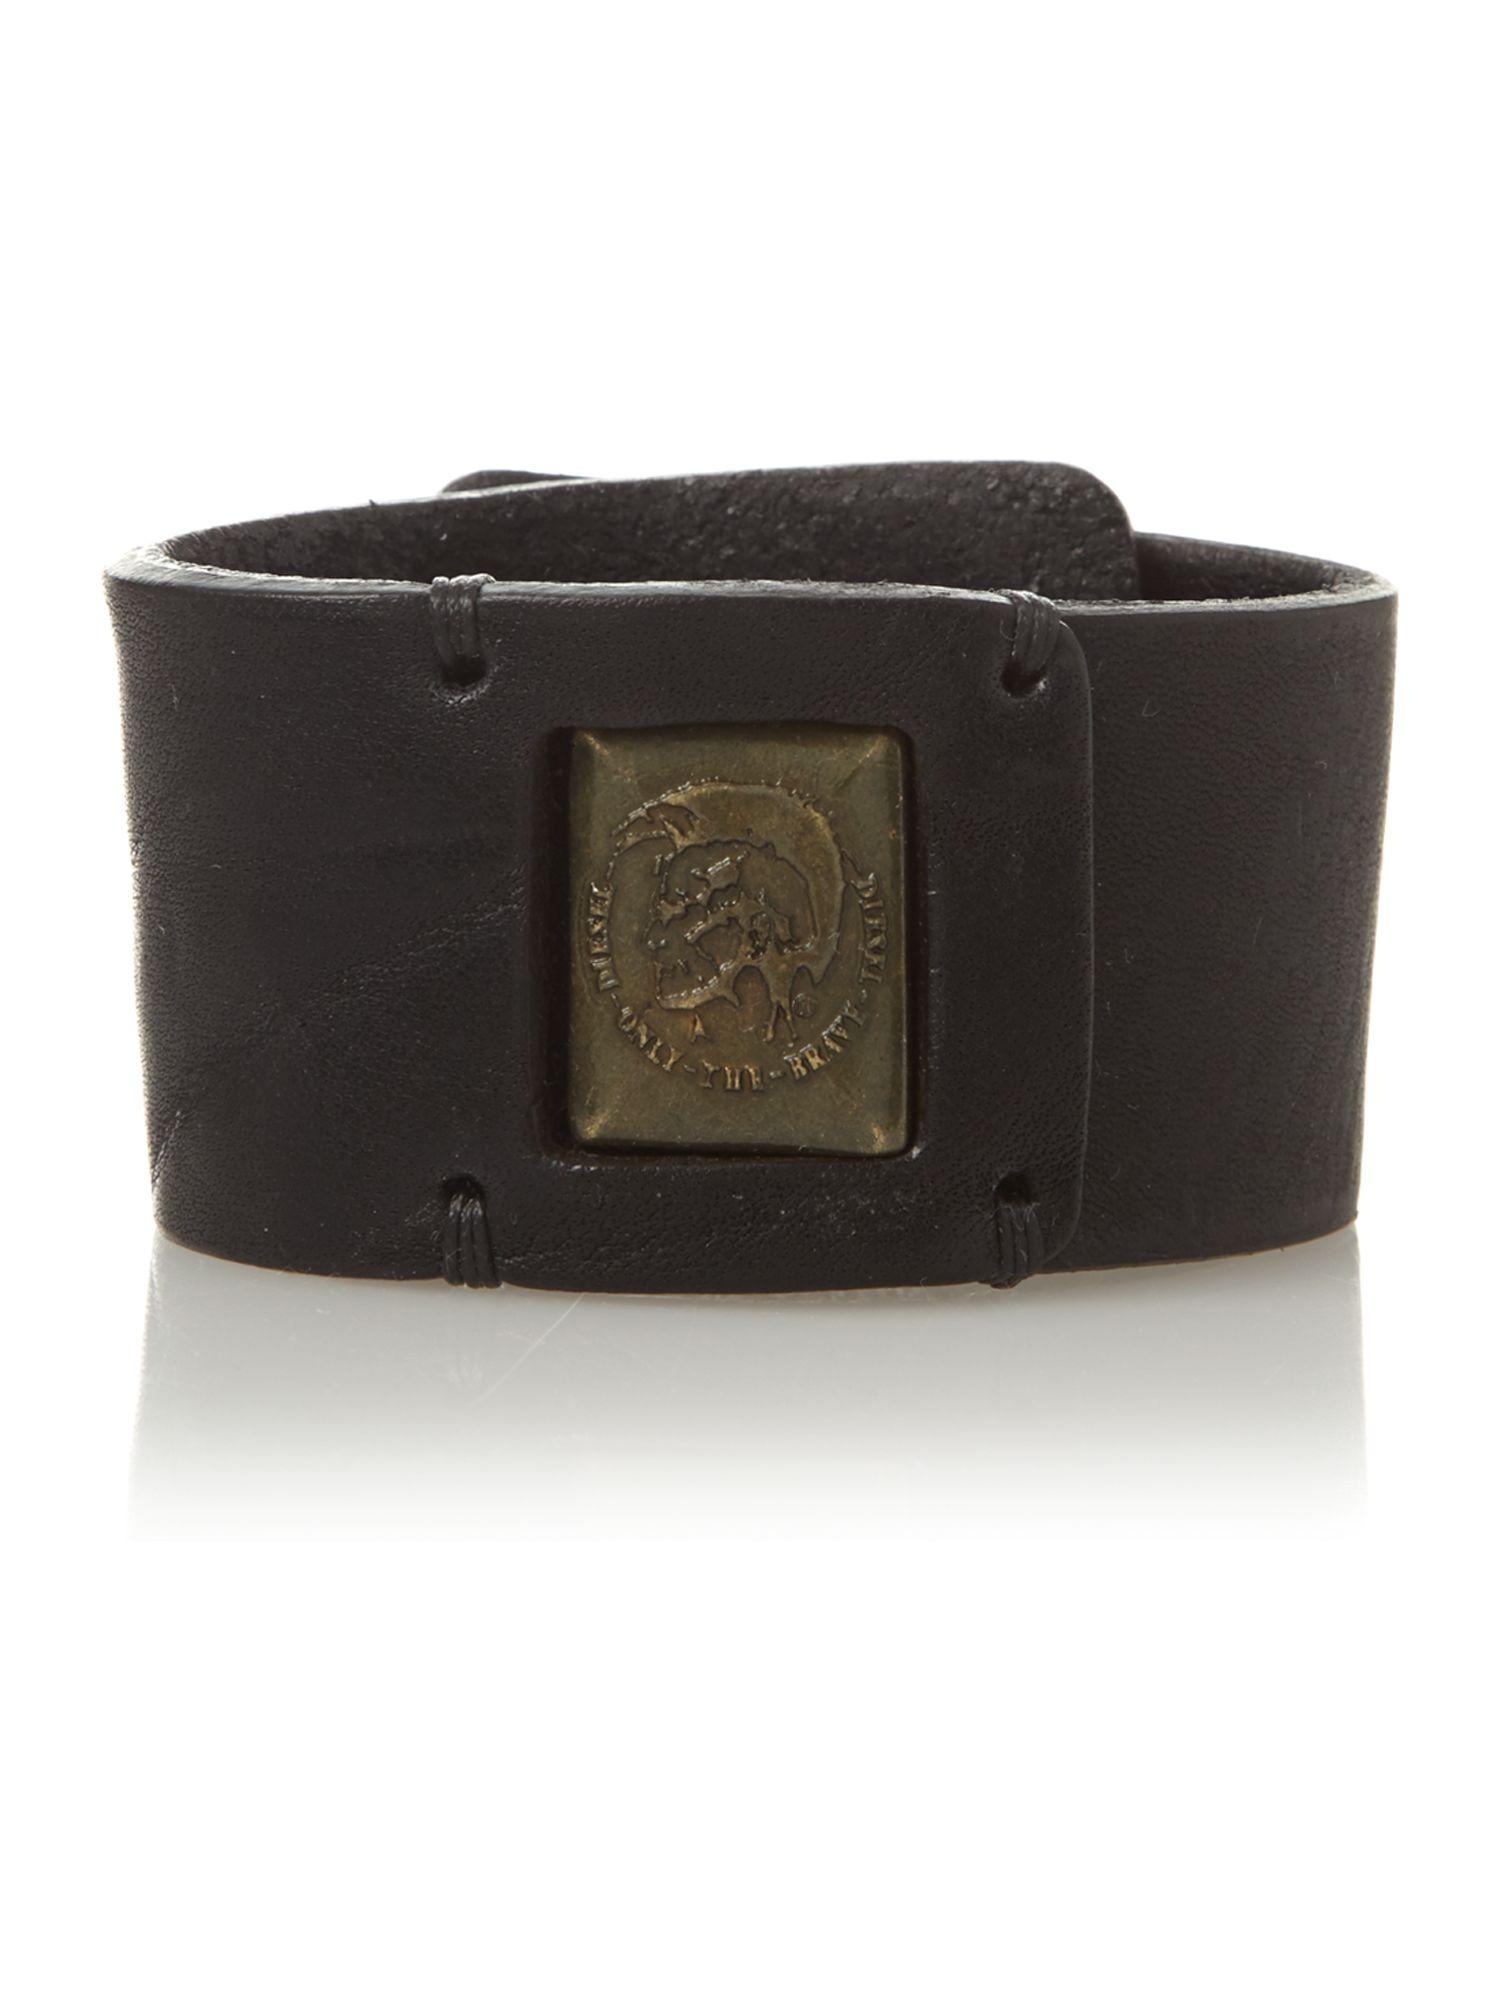 Diesel Engraved Leather Cuff Bracelet In Black For Men Lyst